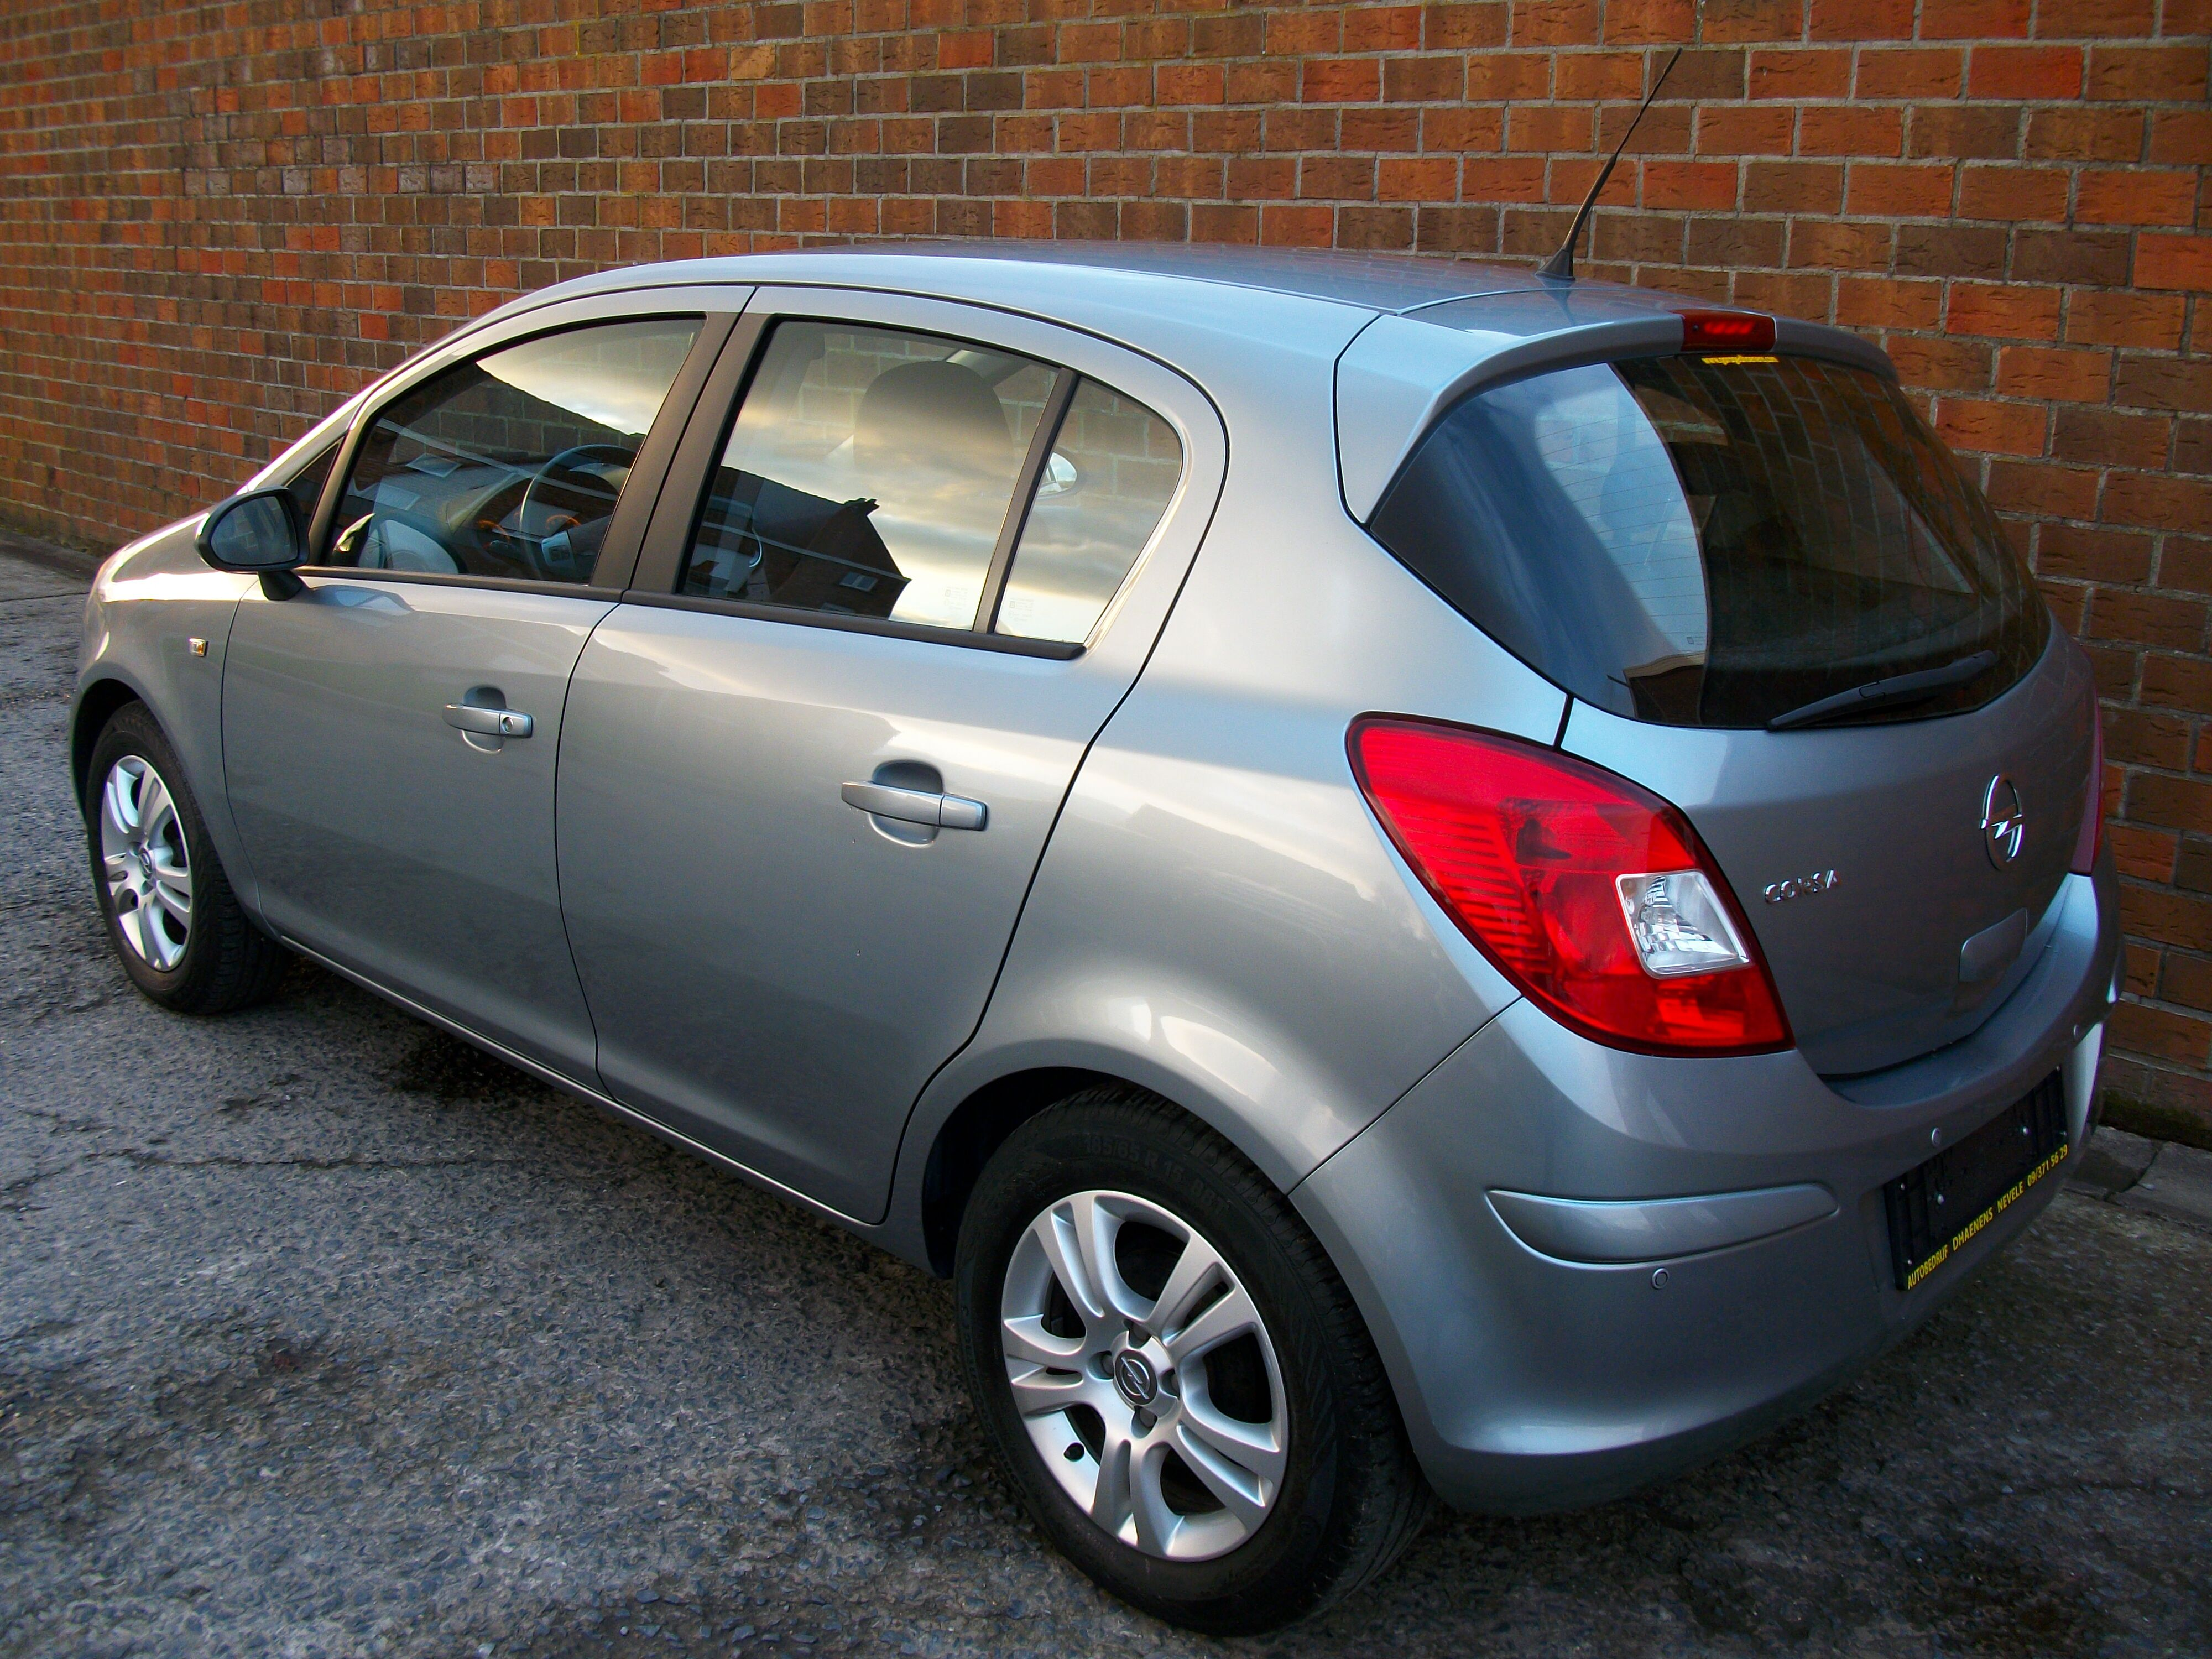 Opel CORSA - 2011 1.2 Benz - weinig kilometers 9/11